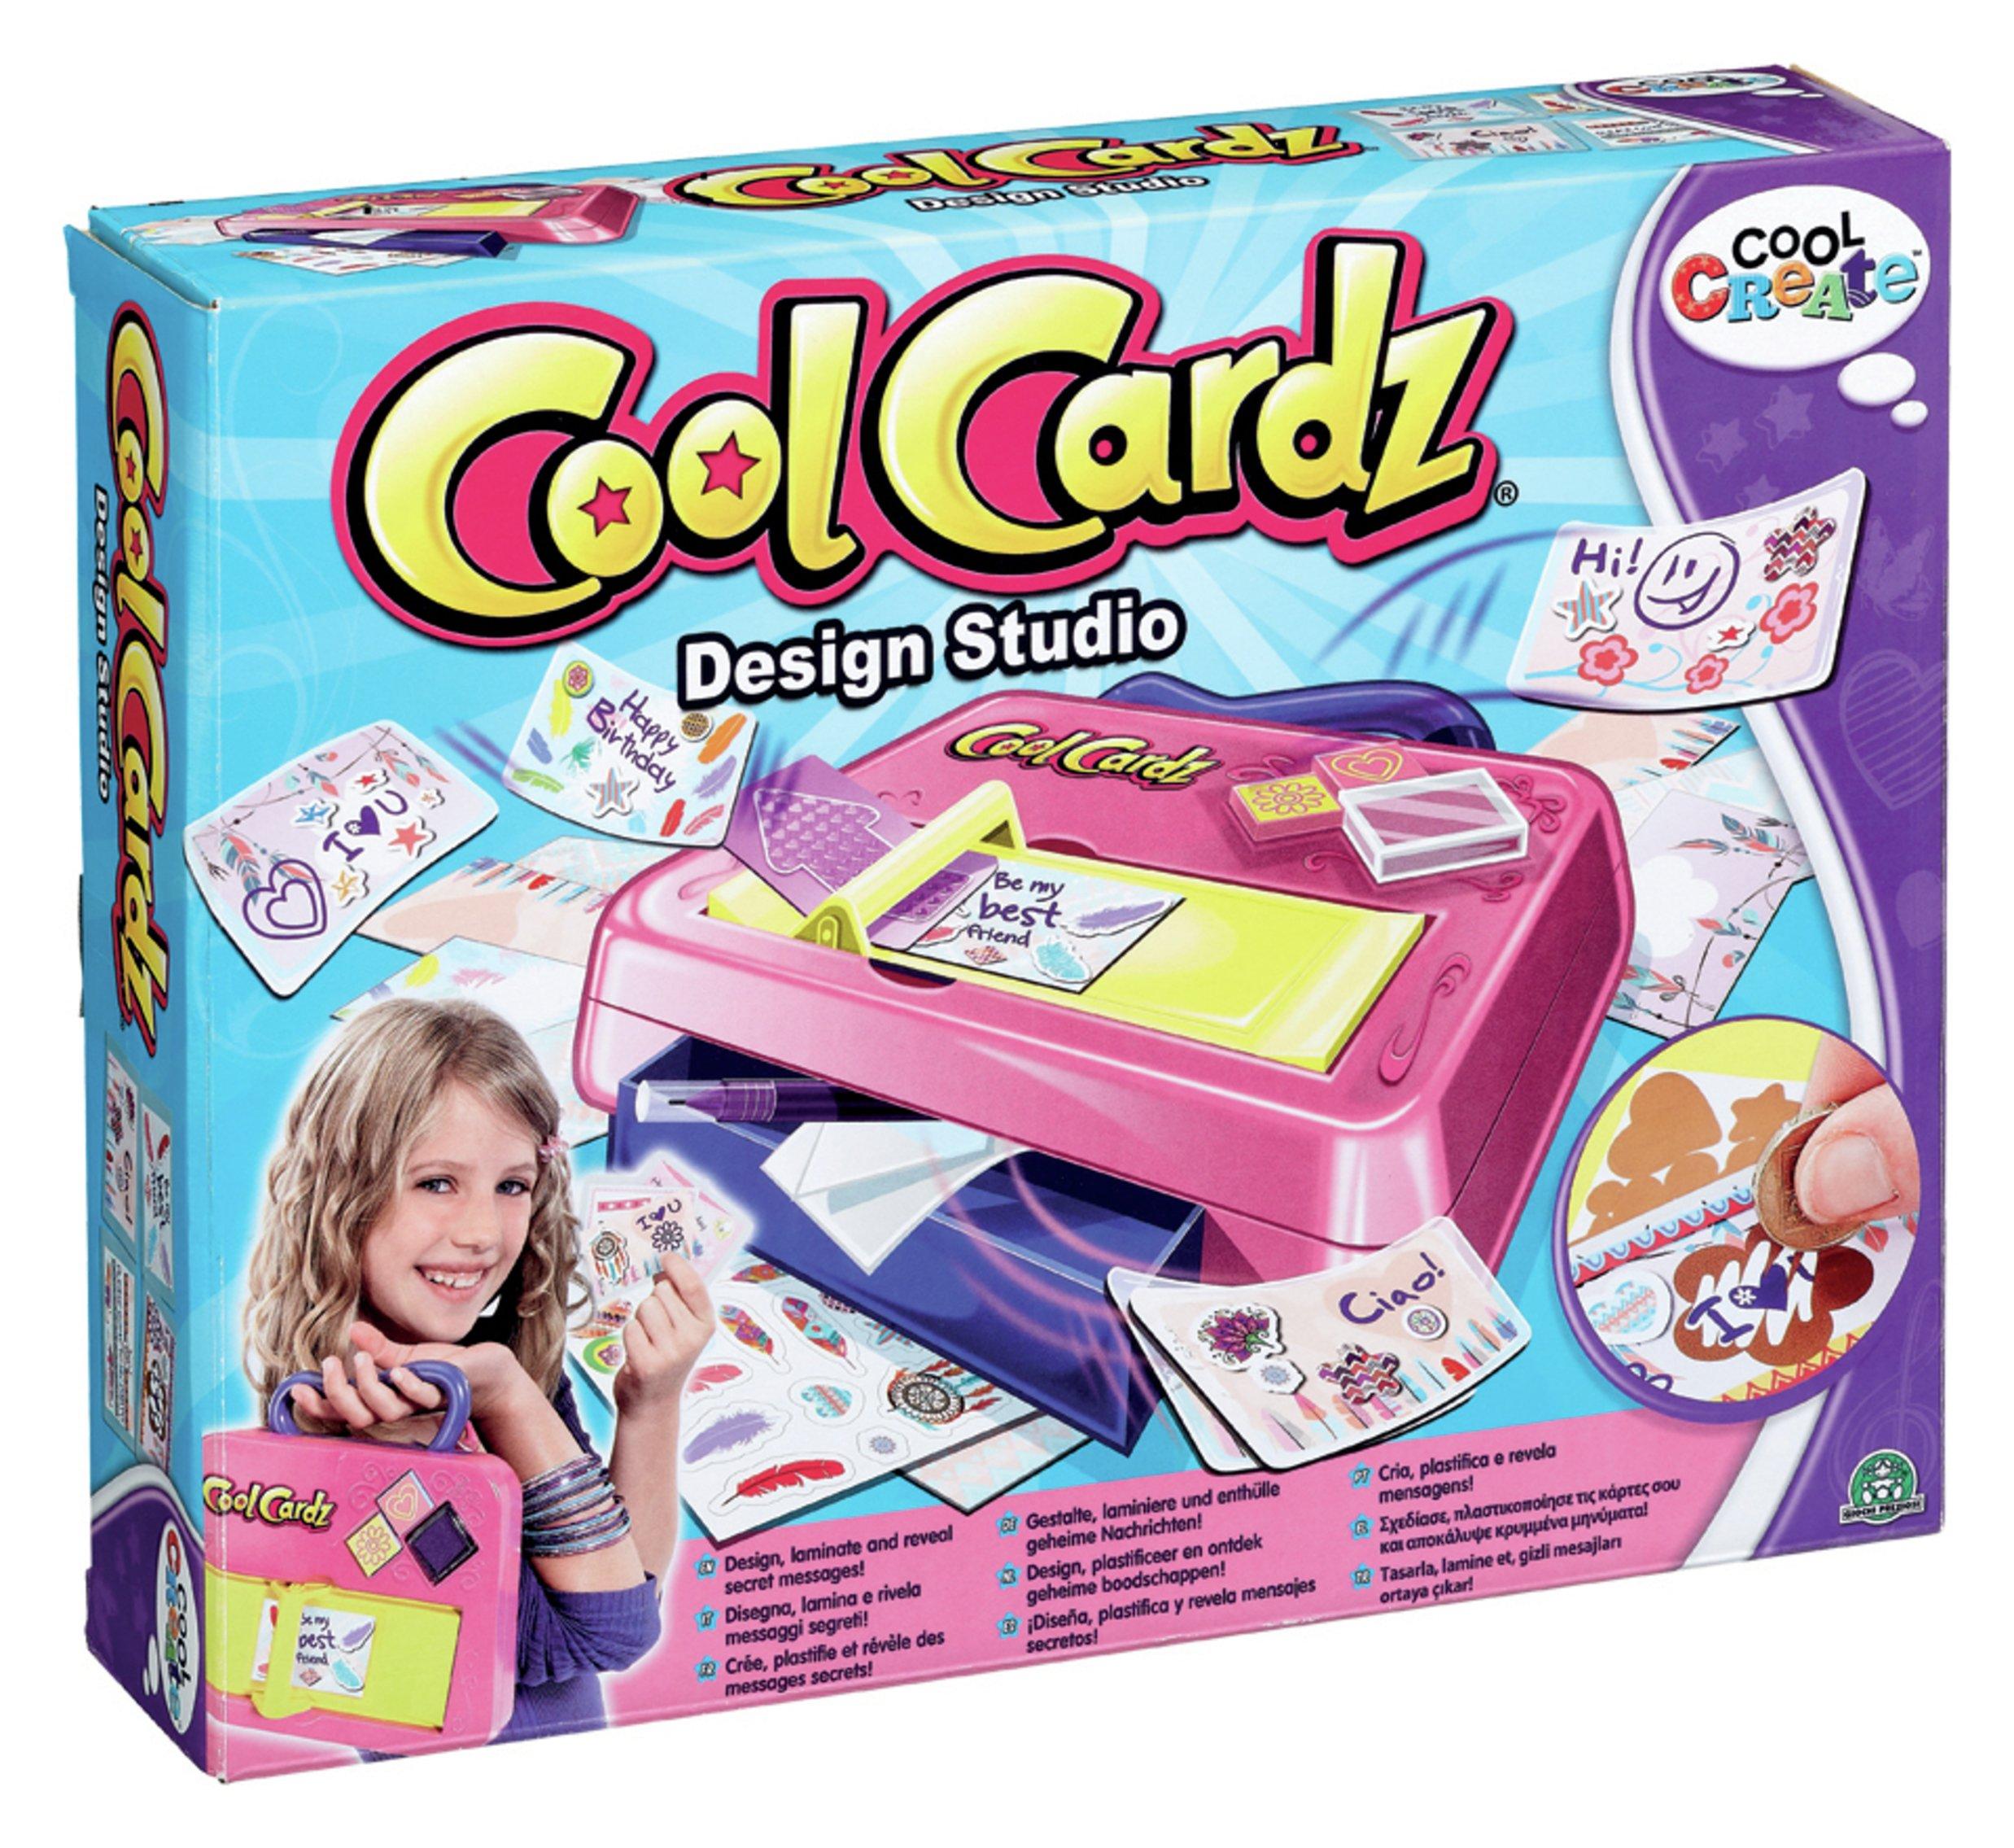 cool-cardz-design-studio